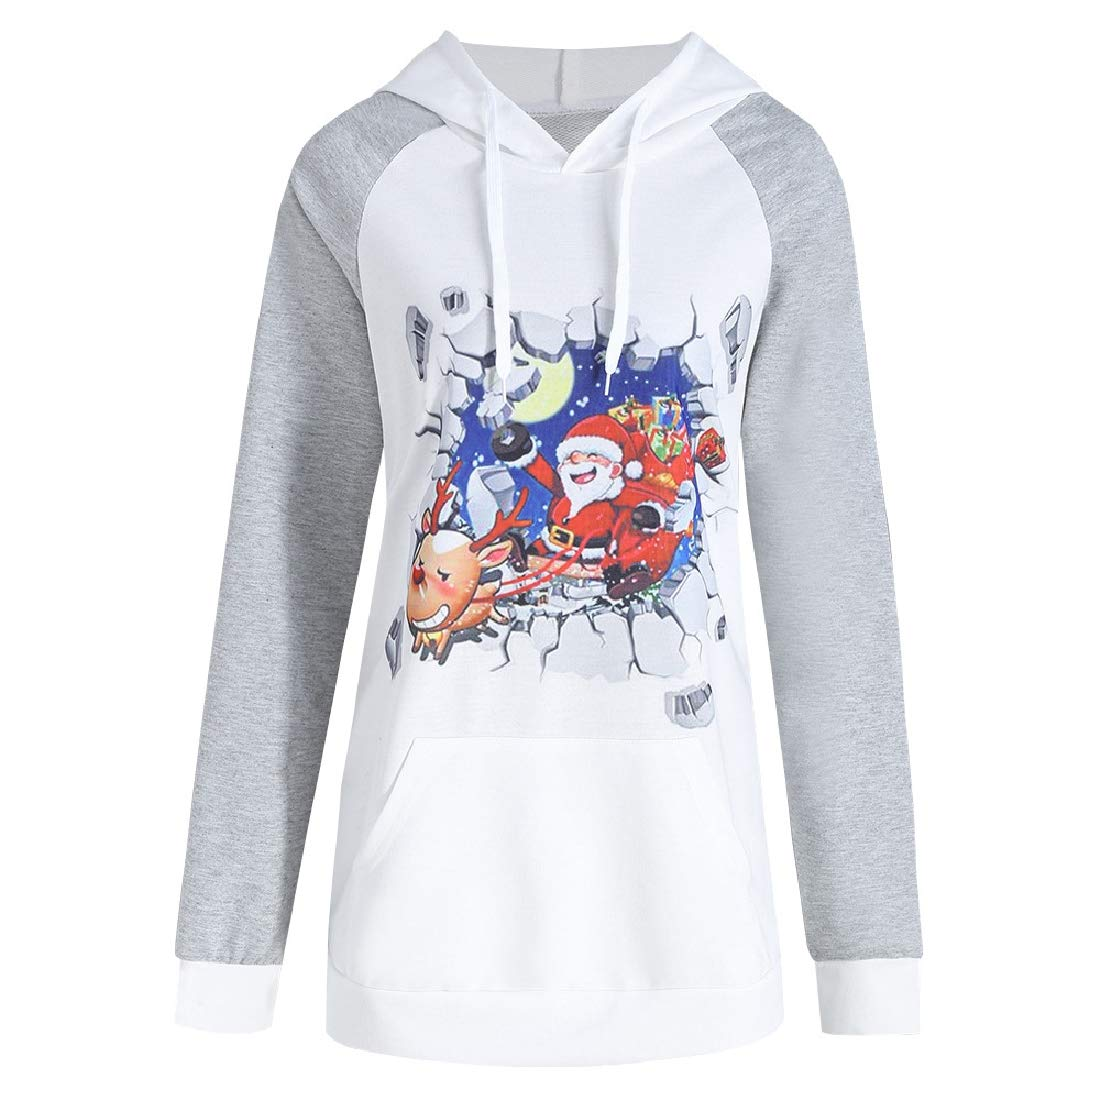 YUNY Women Fall Winter Long-Sleeve Hood Leisure Raglan Christmas Tshirt Light Grey XL